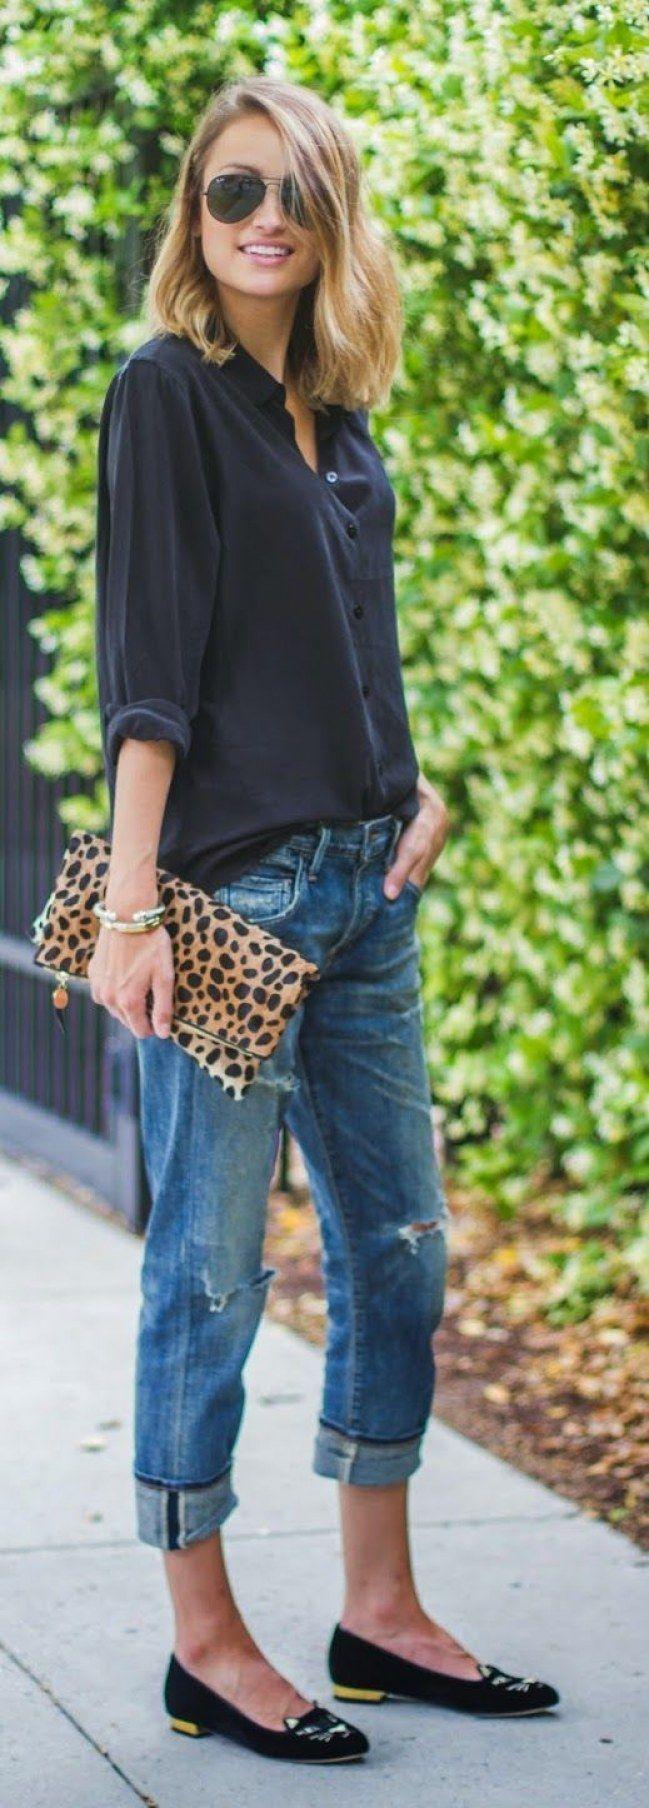 Black Shirt outfits - ready to copy! #black #shirt #outfits #blackshirt #shirt #jeans #boyfriendjeans